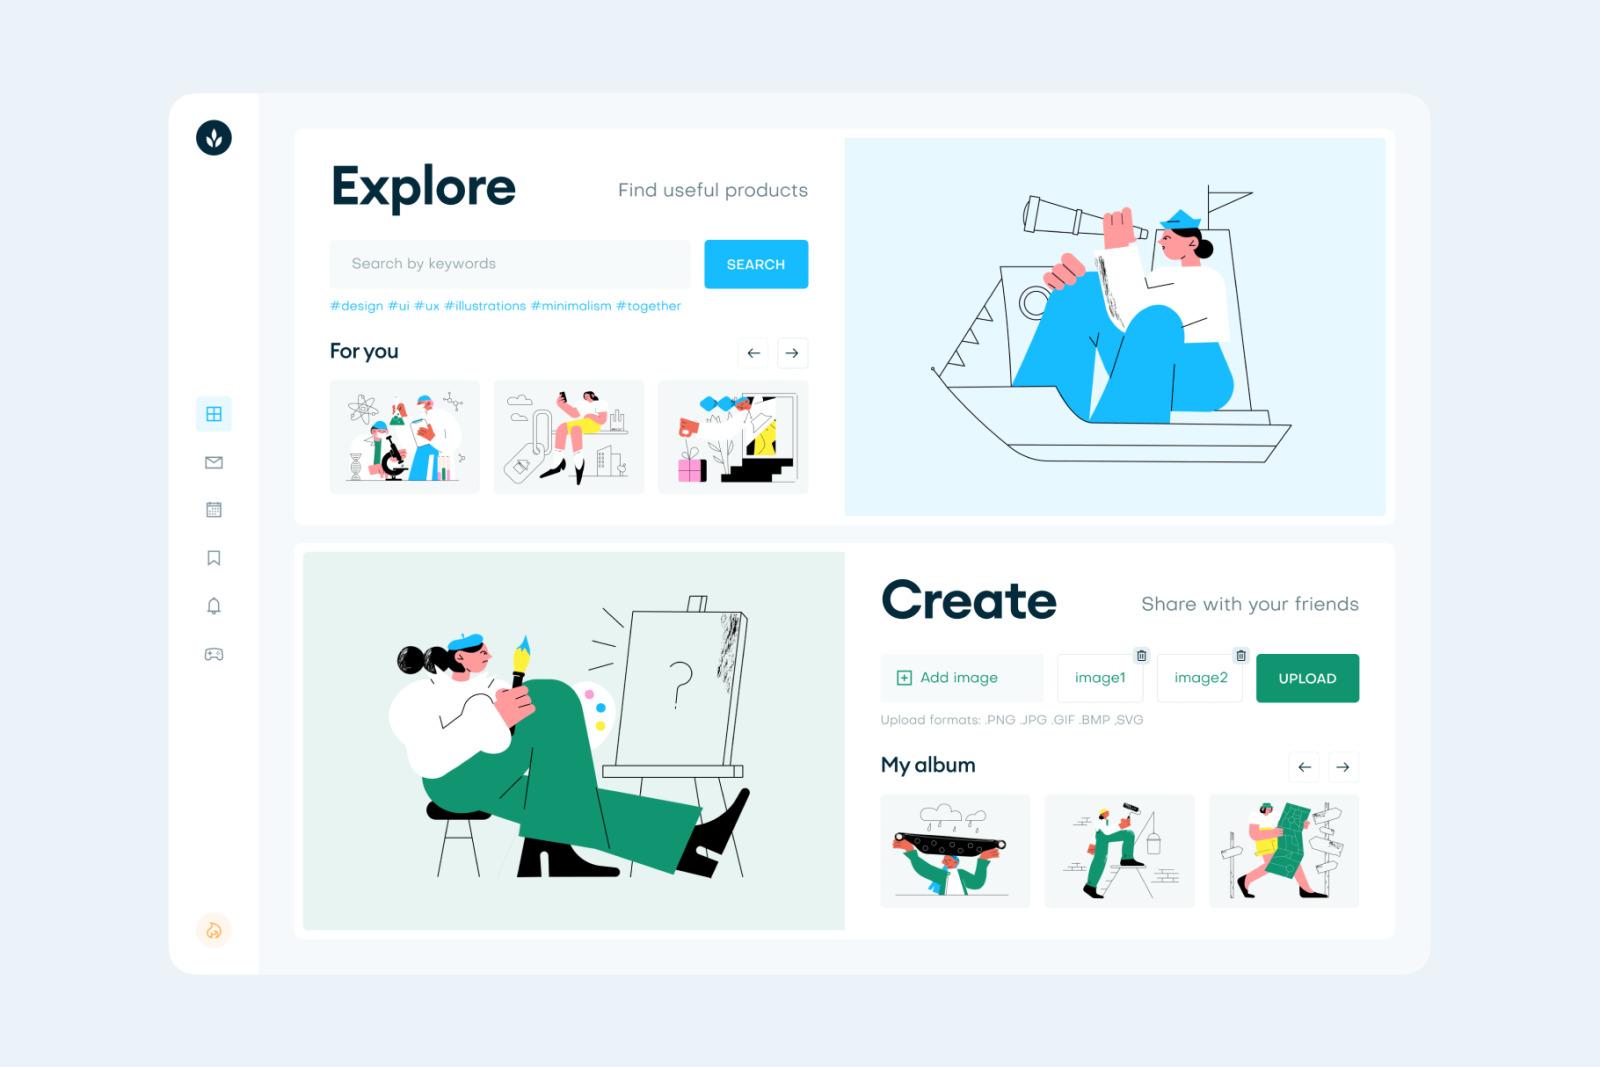 Come Together Illustrations